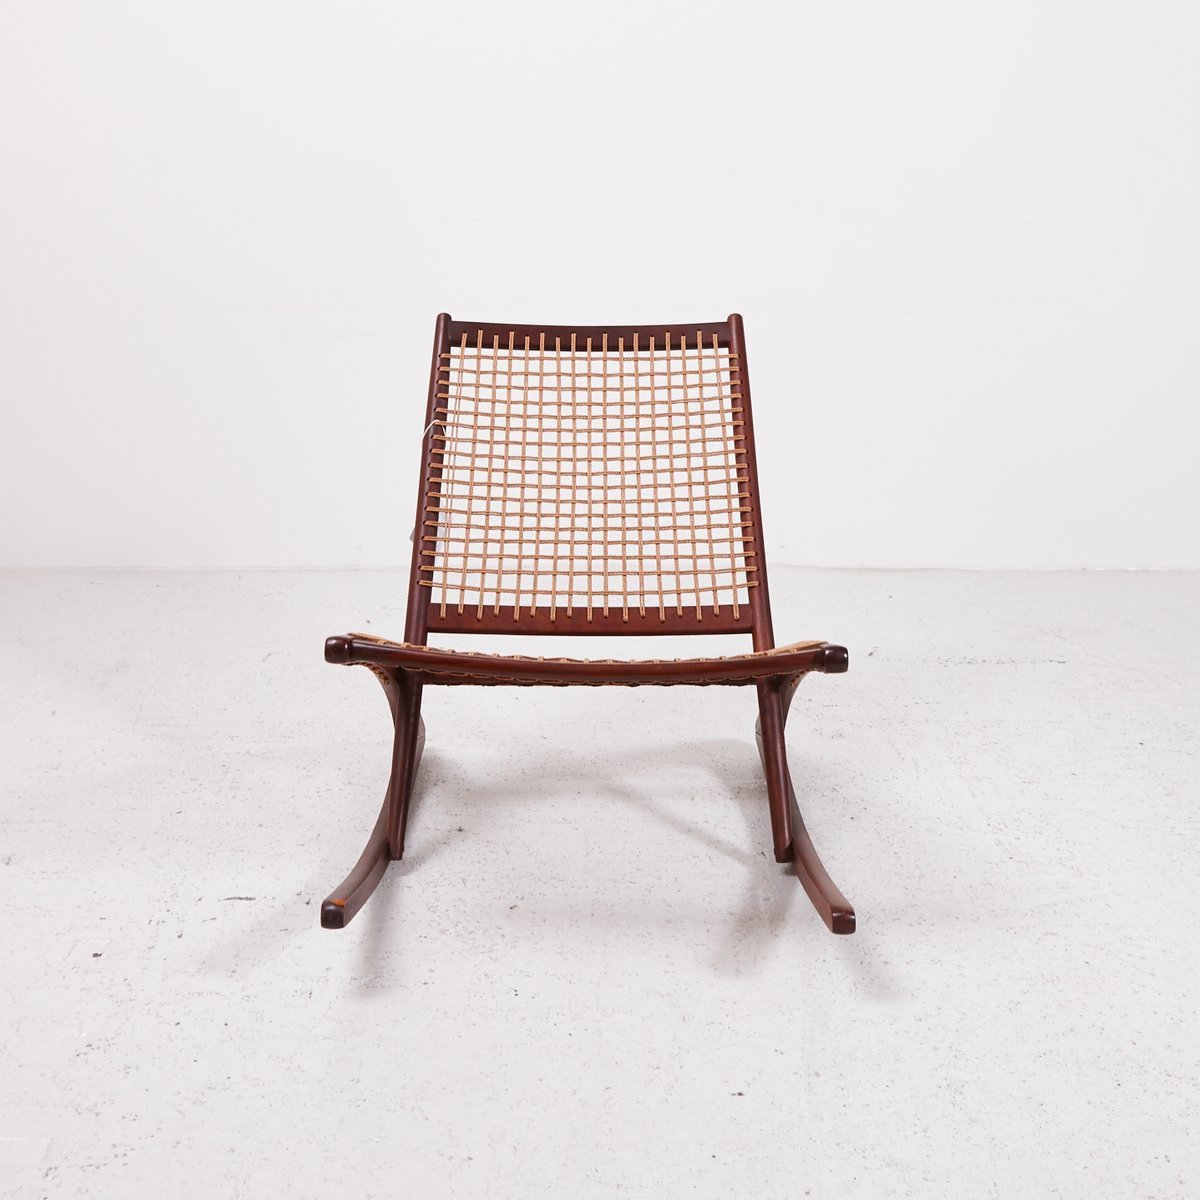 vintage teak schaukelstuhl mit papierkordel bei pamono kaufen. Black Bedroom Furniture Sets. Home Design Ideas